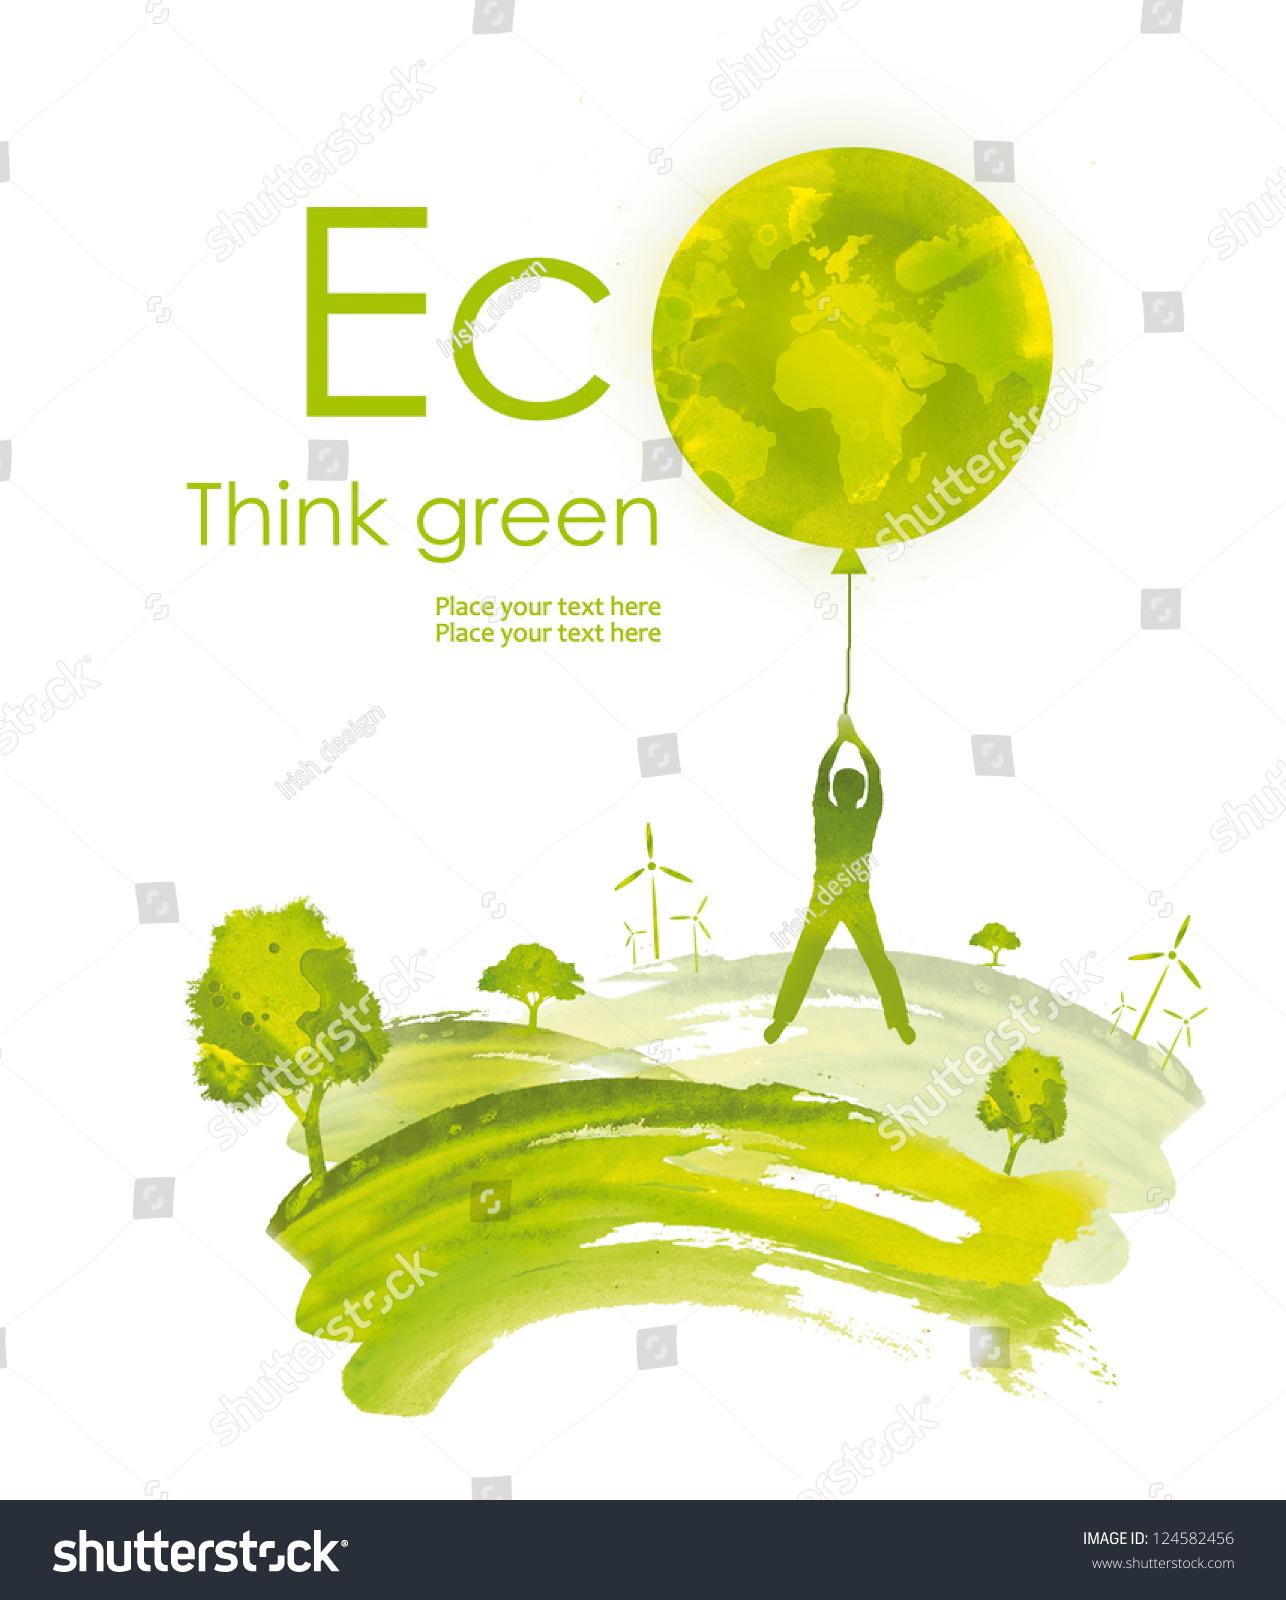 Environmental Concept Earthfriendly Landscapes: Illustration Environmentally Friendly Planet.Green